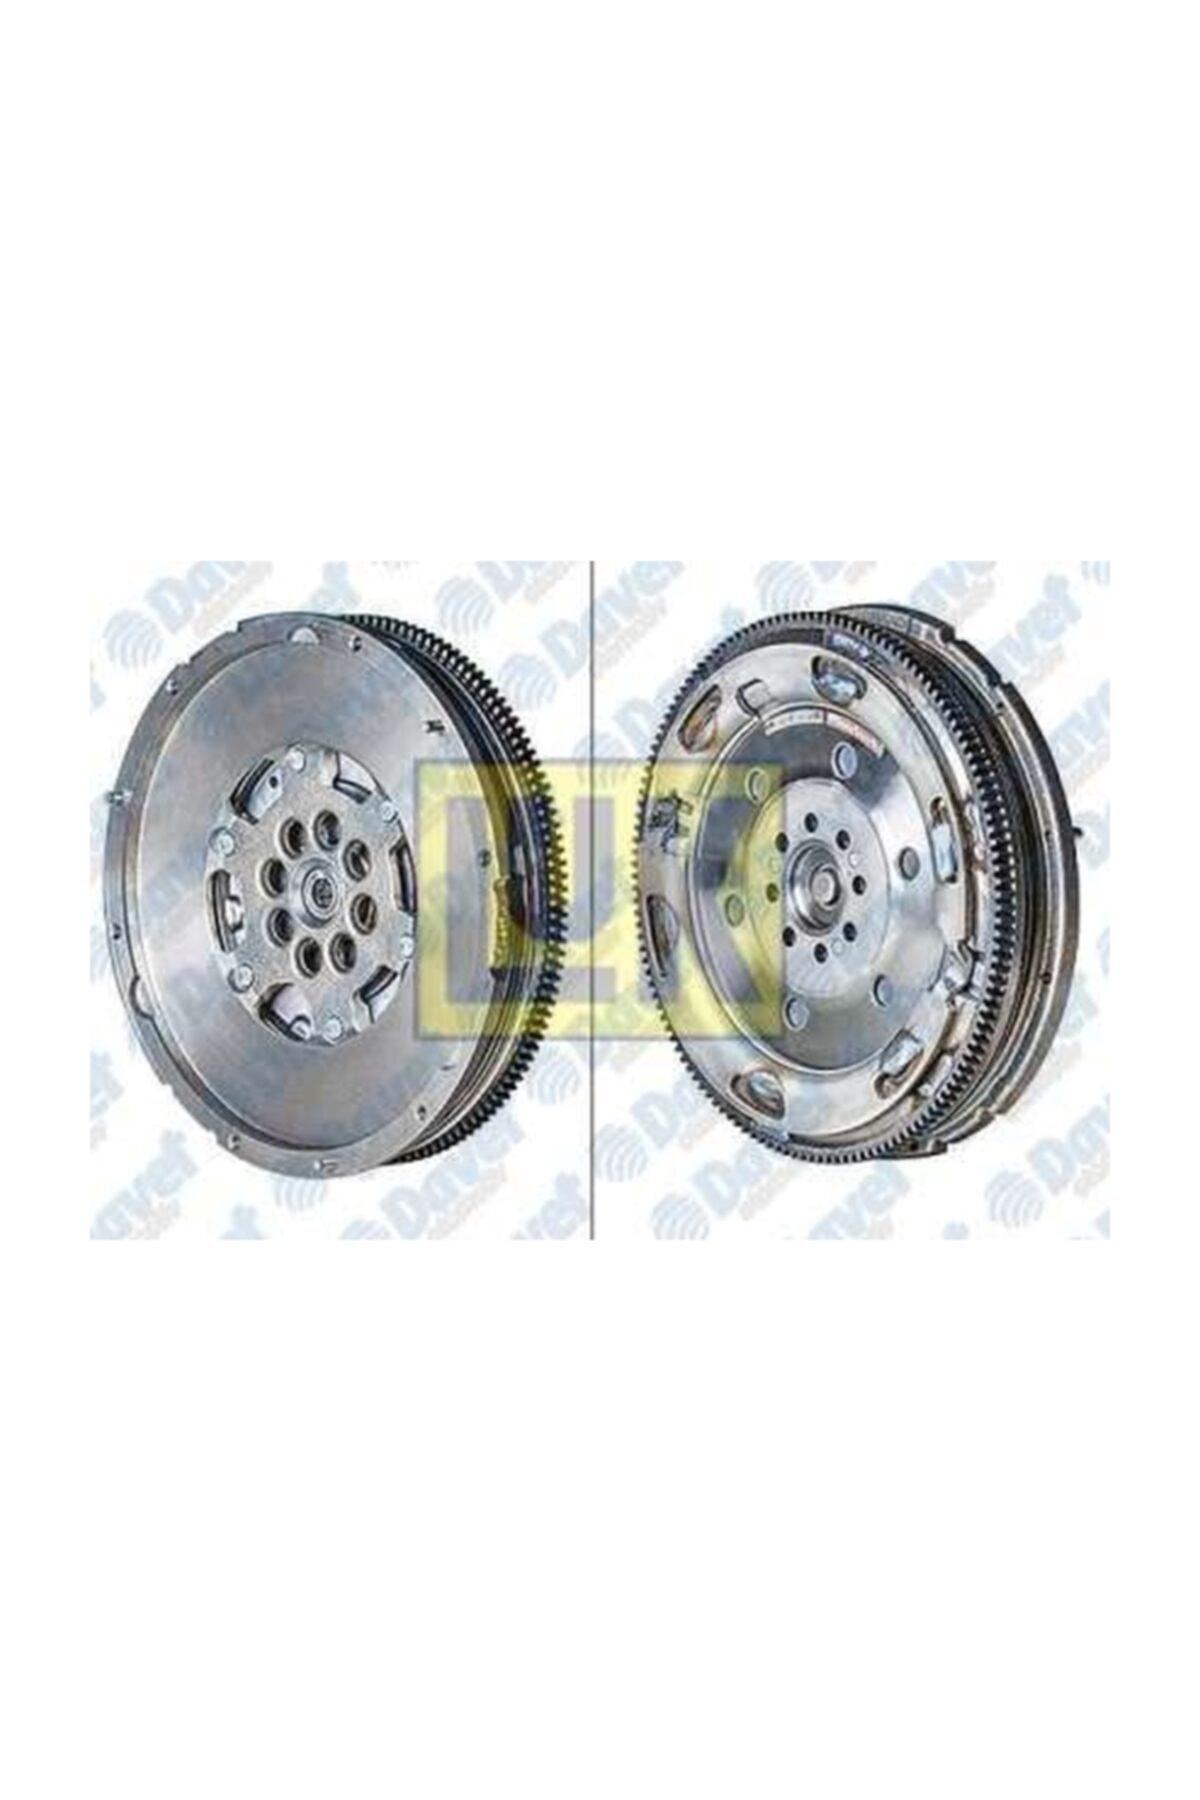 Baysal Volant 260Mm ( Vw :crafter 2.5Tdi 06- Bjm Motor ) - Luk-415033610 1